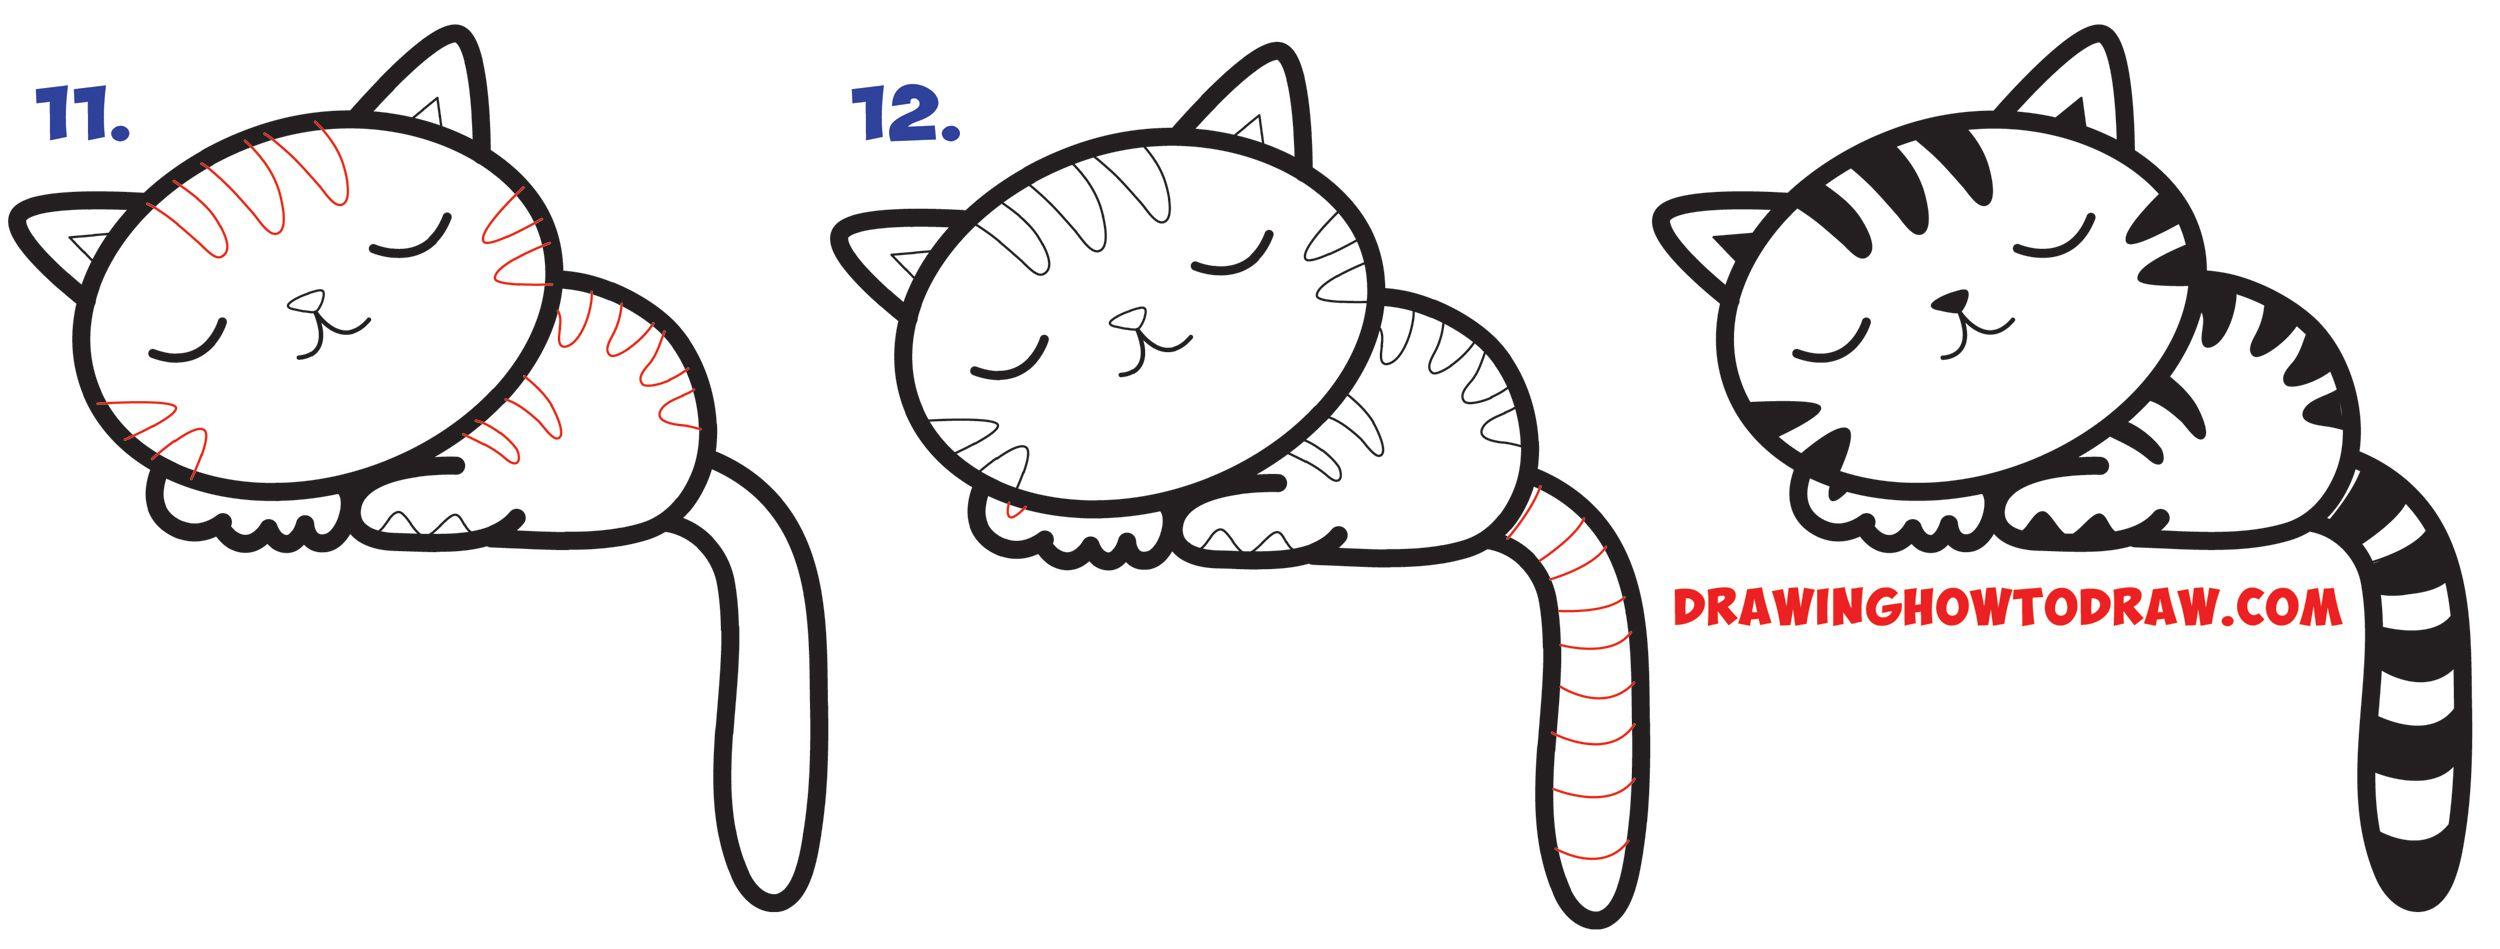 2500x949 How To Draw A Supercute Kawaii Cartoon Cat Kitten Napping Easy